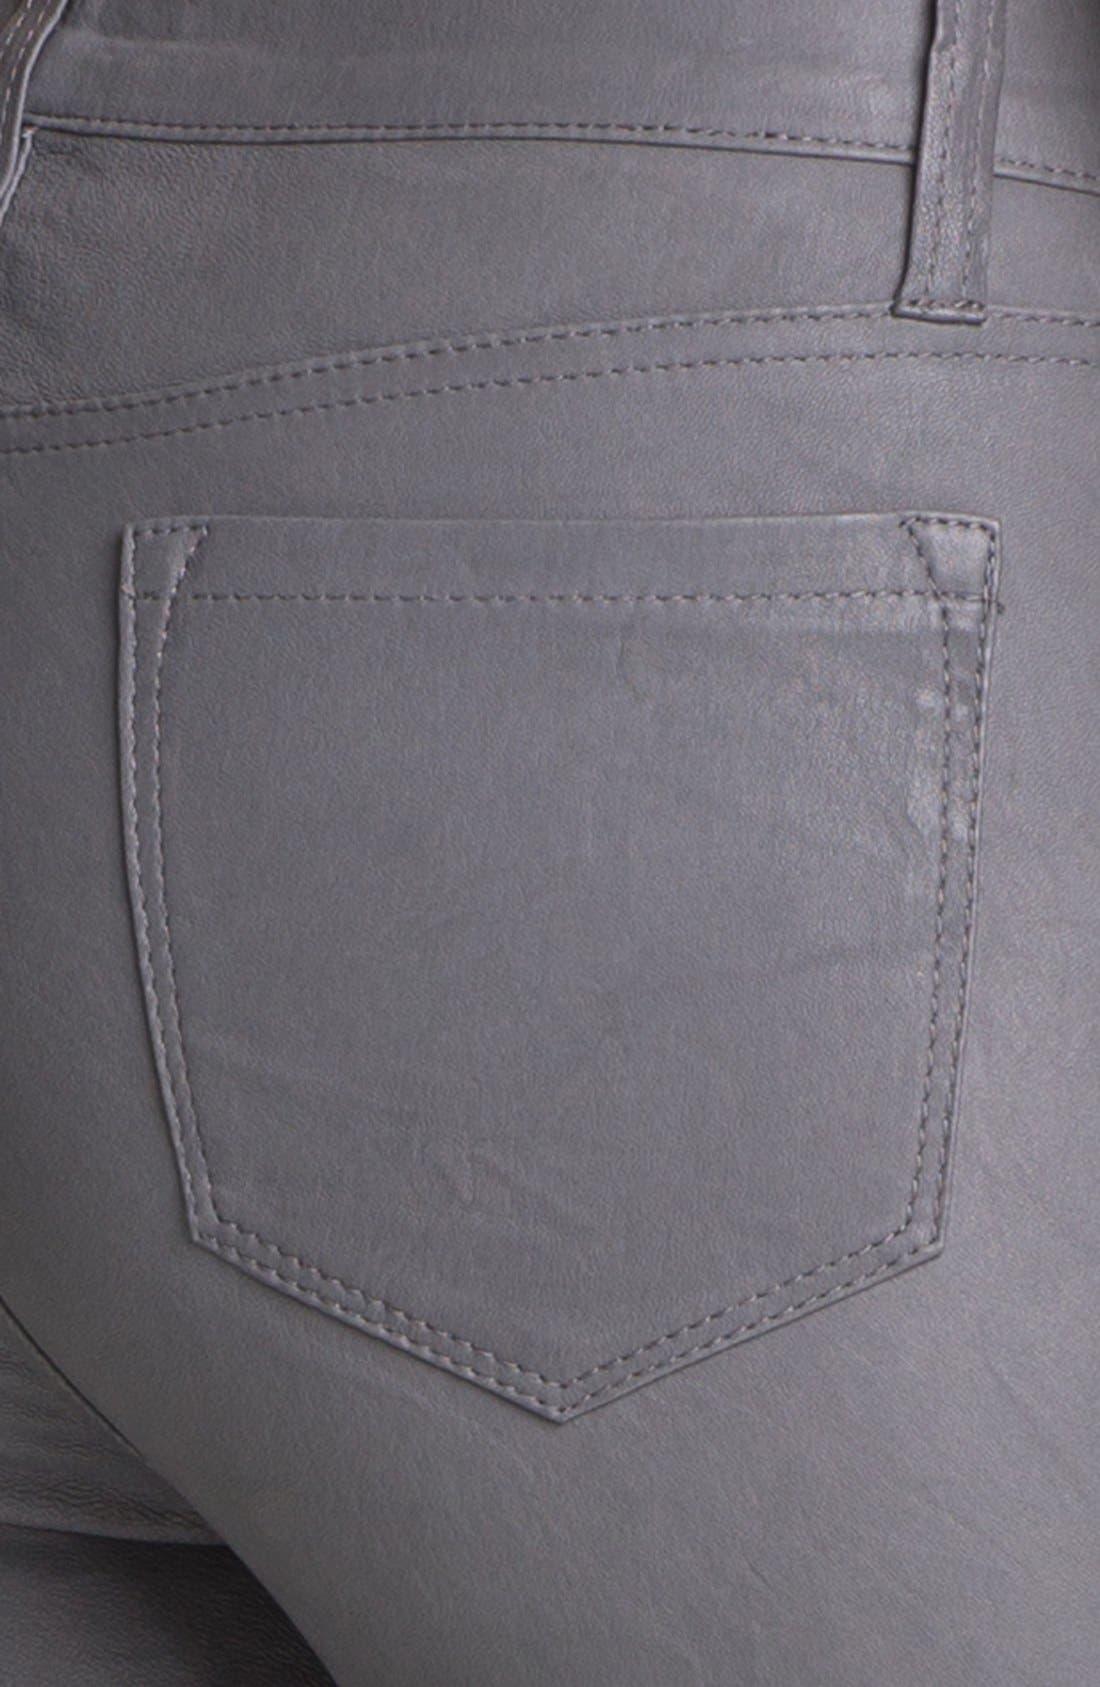 '8001' Lambskin Leather Pants,                             Alternate thumbnail 53, color,